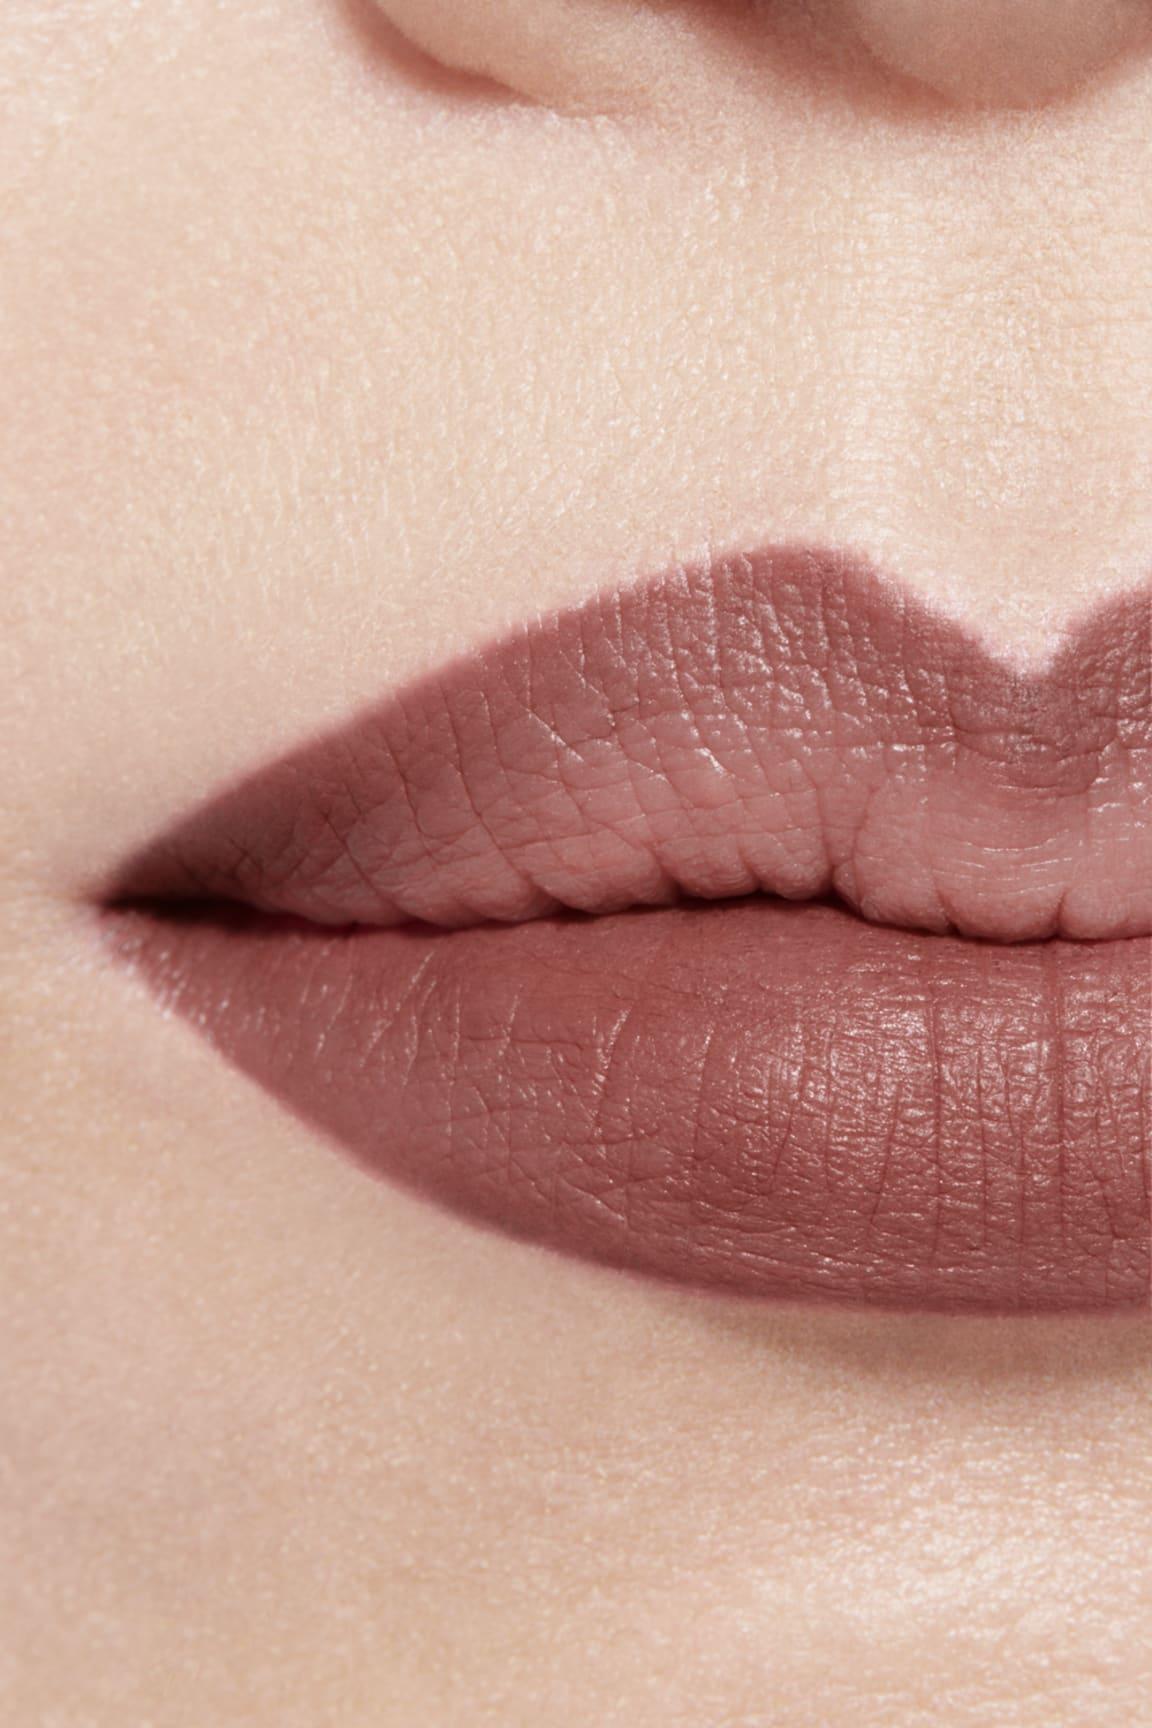 Application makeup visual 1 - LE CRAYON LÈVRES 158 - ROSE NATUREL